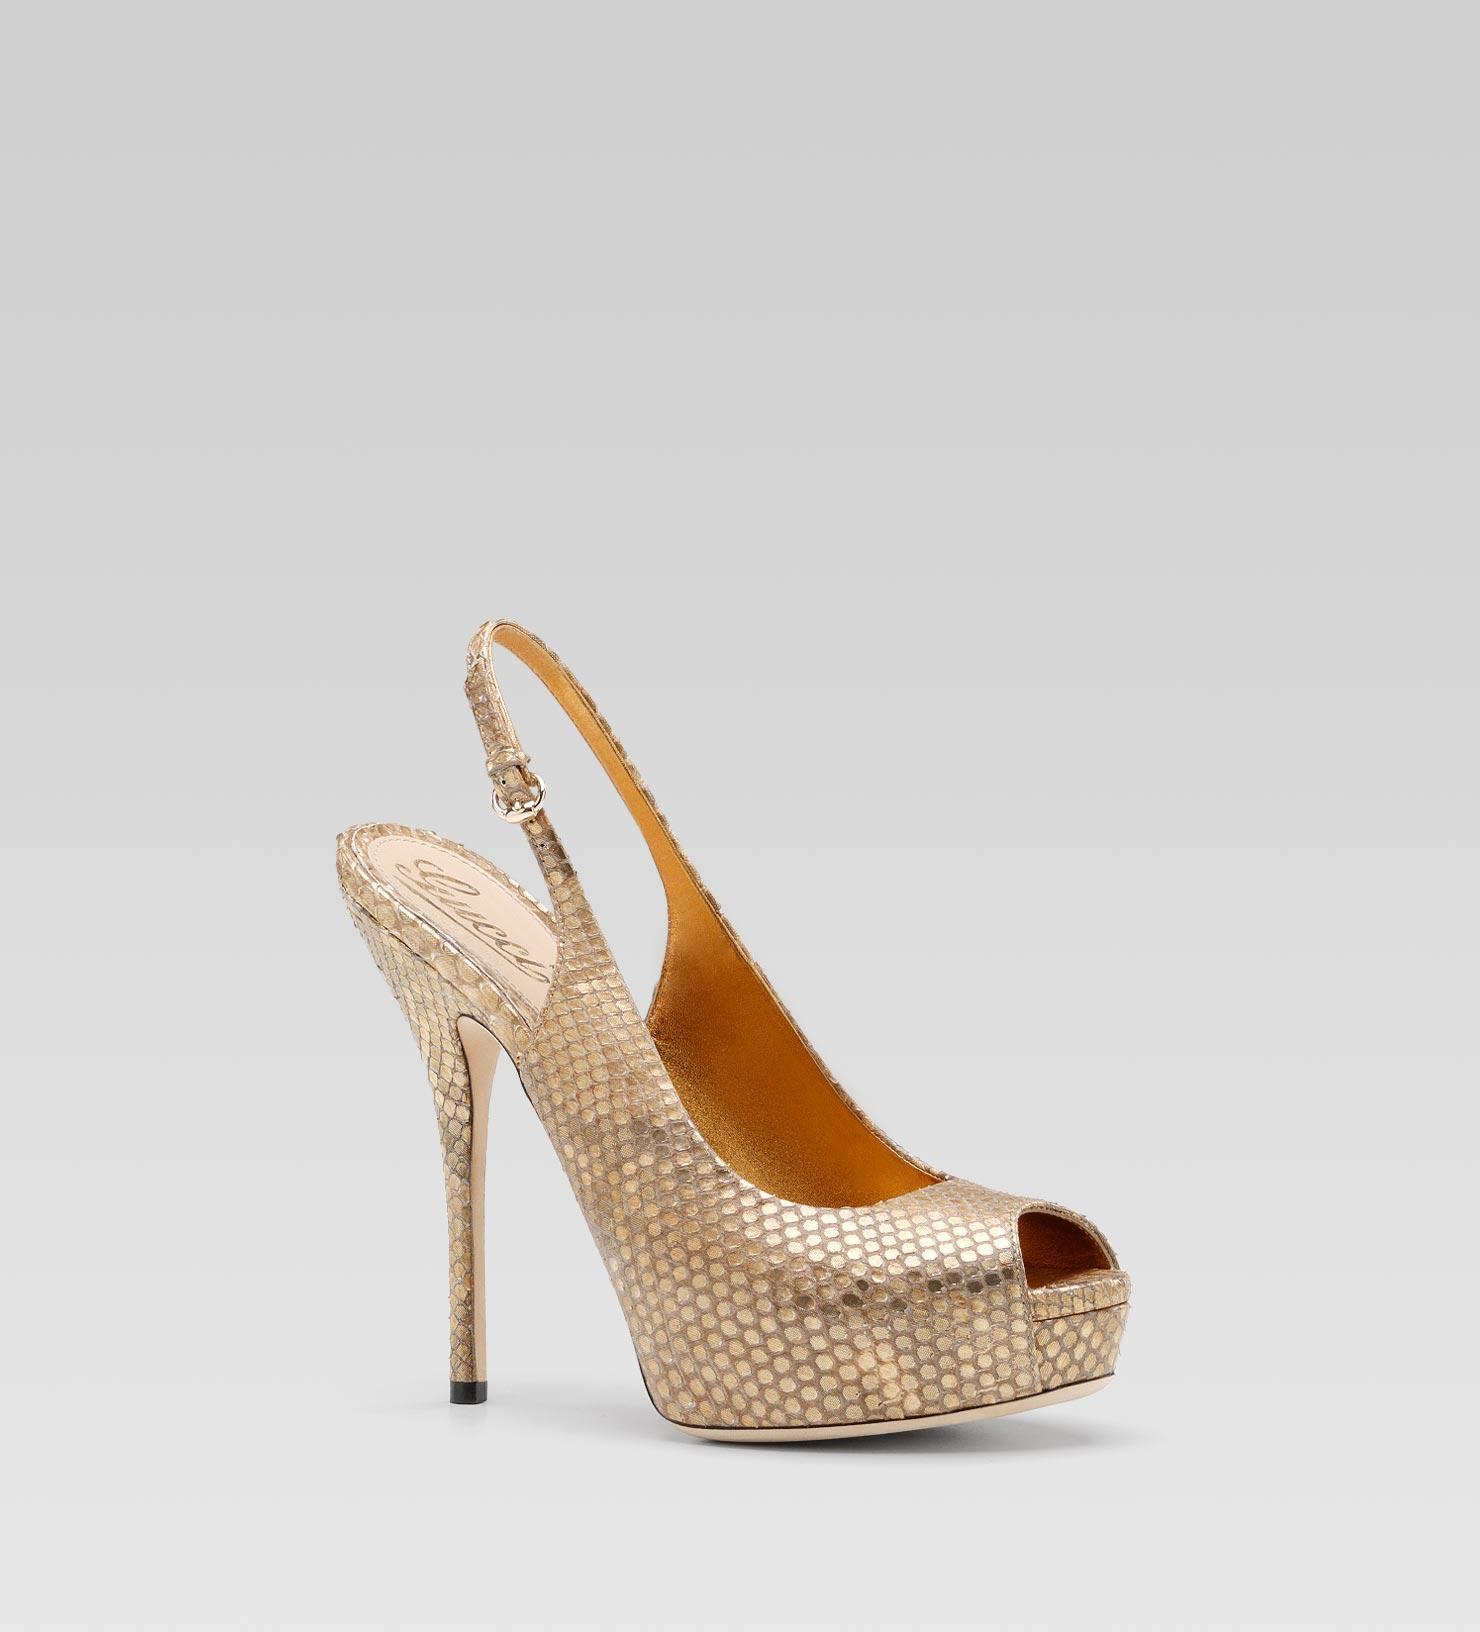 gucci sofia high heel slingback platform sandal in metallic lyst. Black Bedroom Furniture Sets. Home Design Ideas